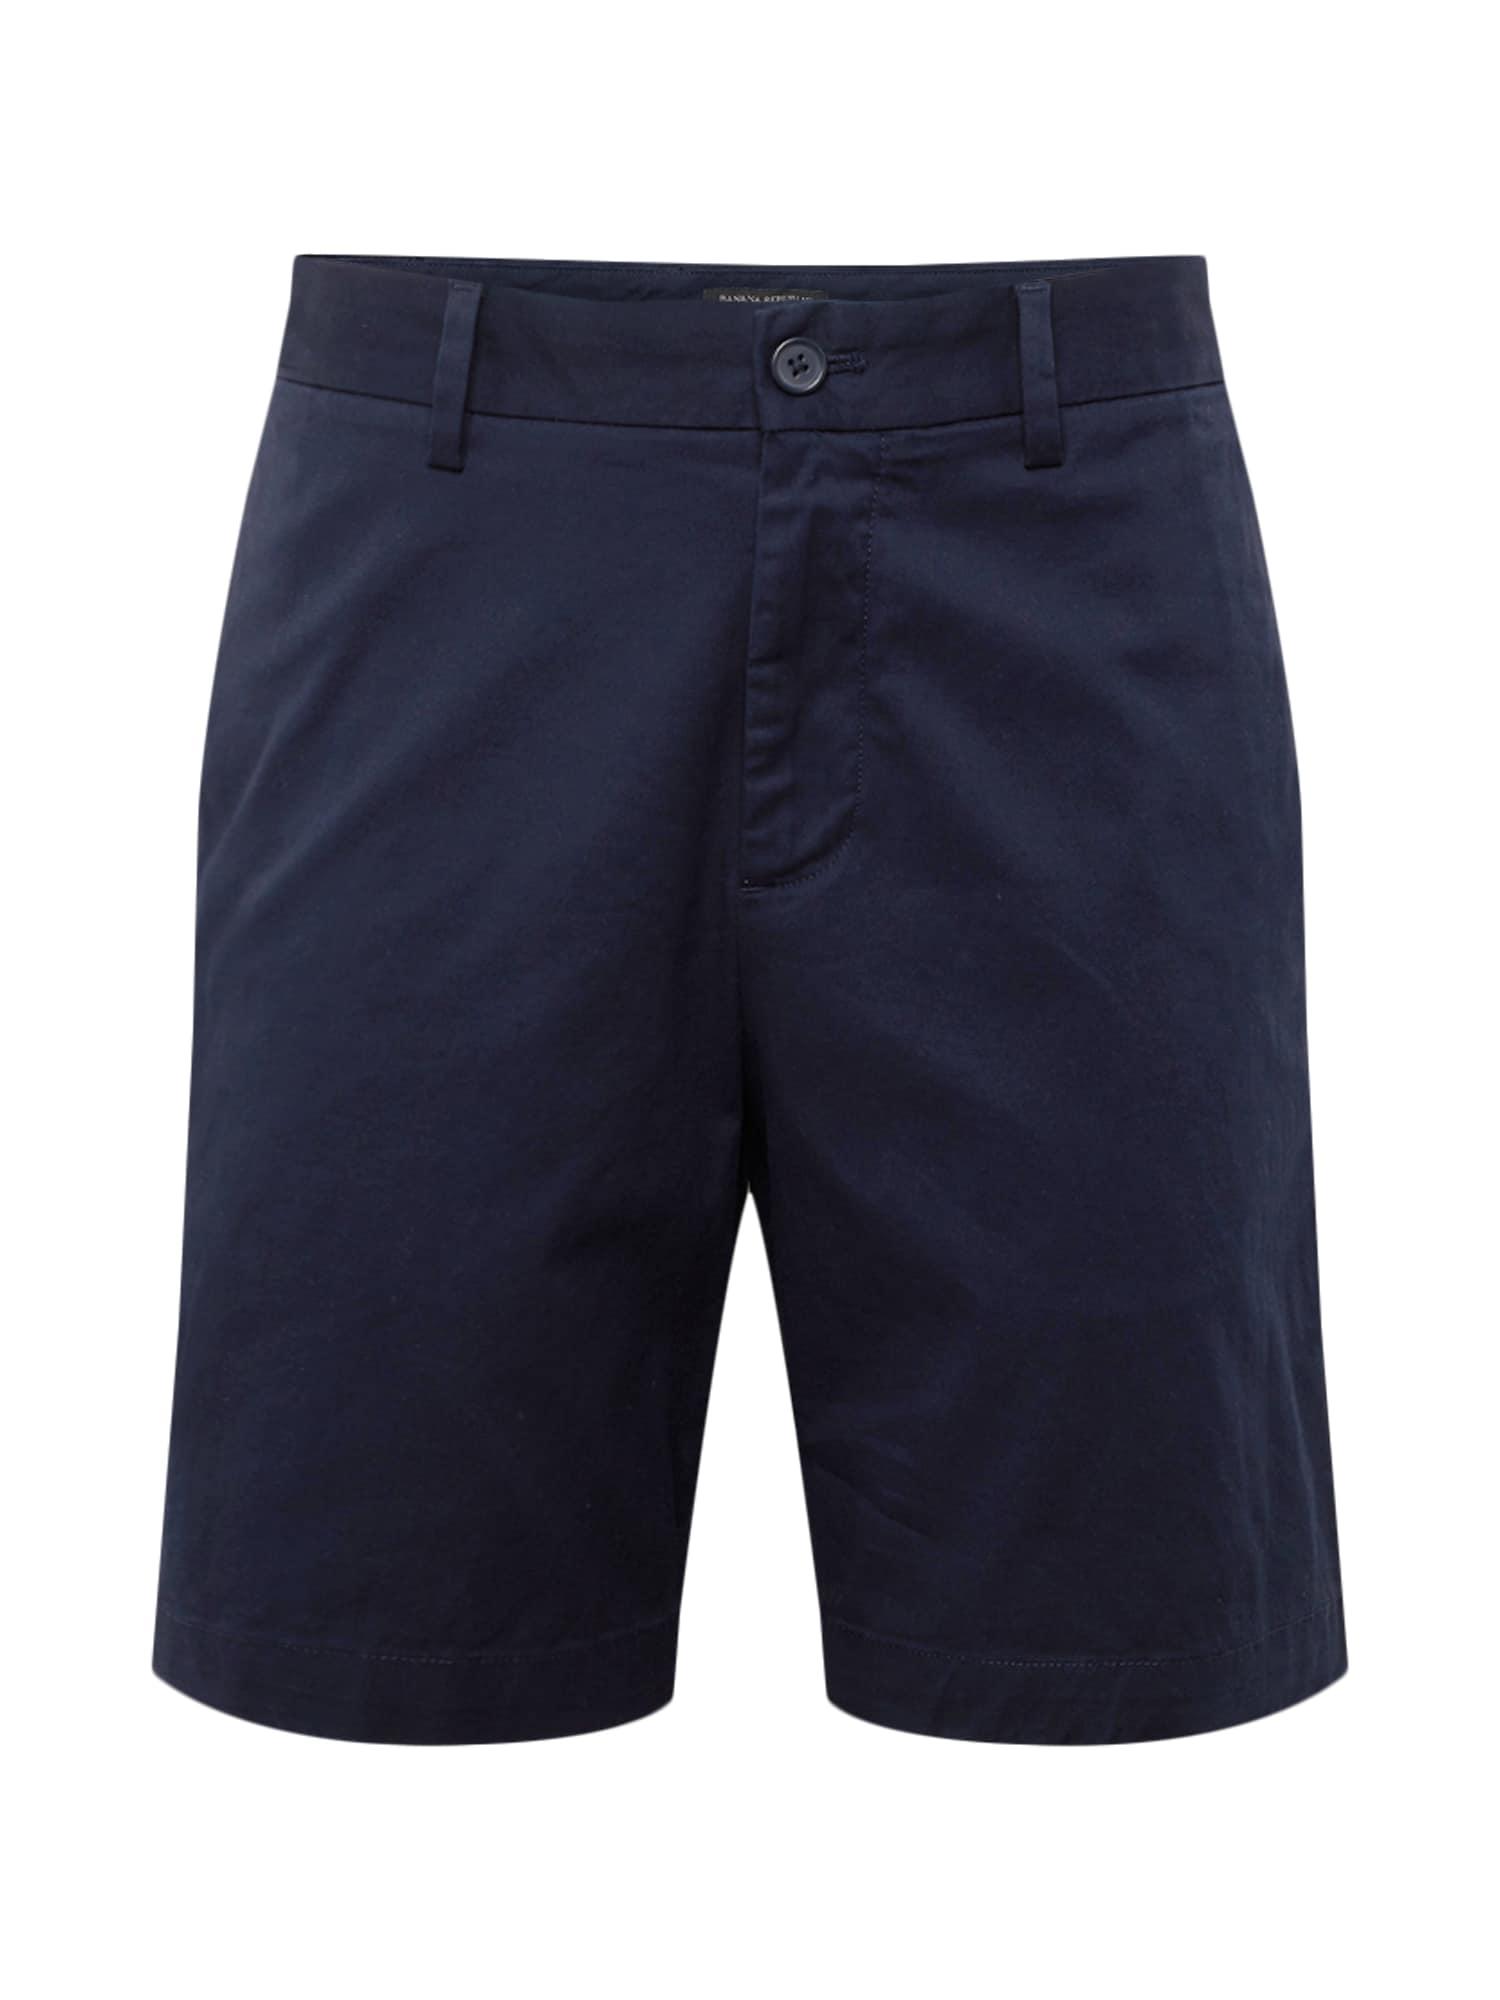 Chino kalhoty AIDEN 9 NEW SOLID námořnická modř Banana Republic